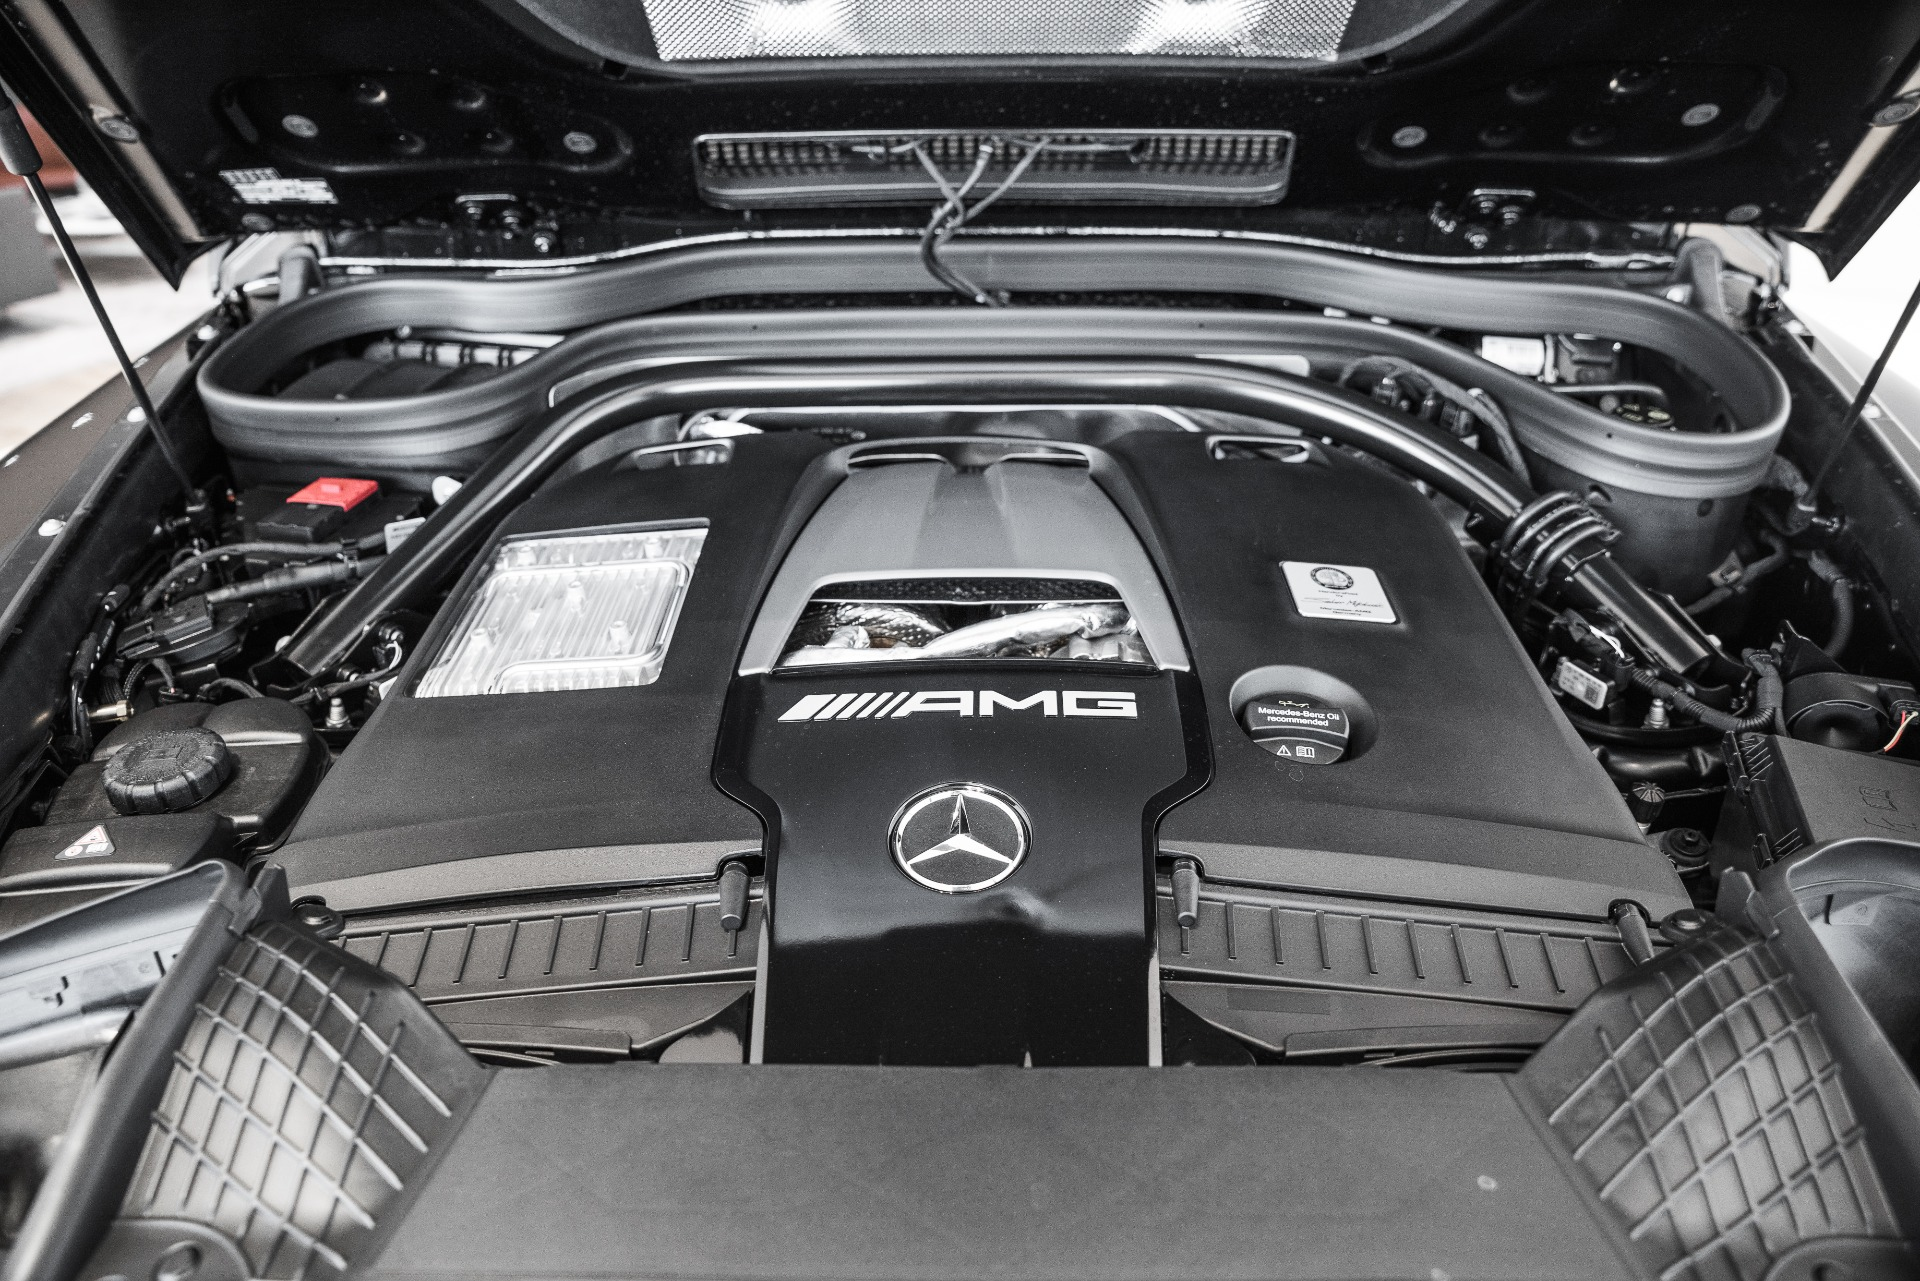 Used-2020-Mercedes-Benz-G-Class-AMG-G63.jpg